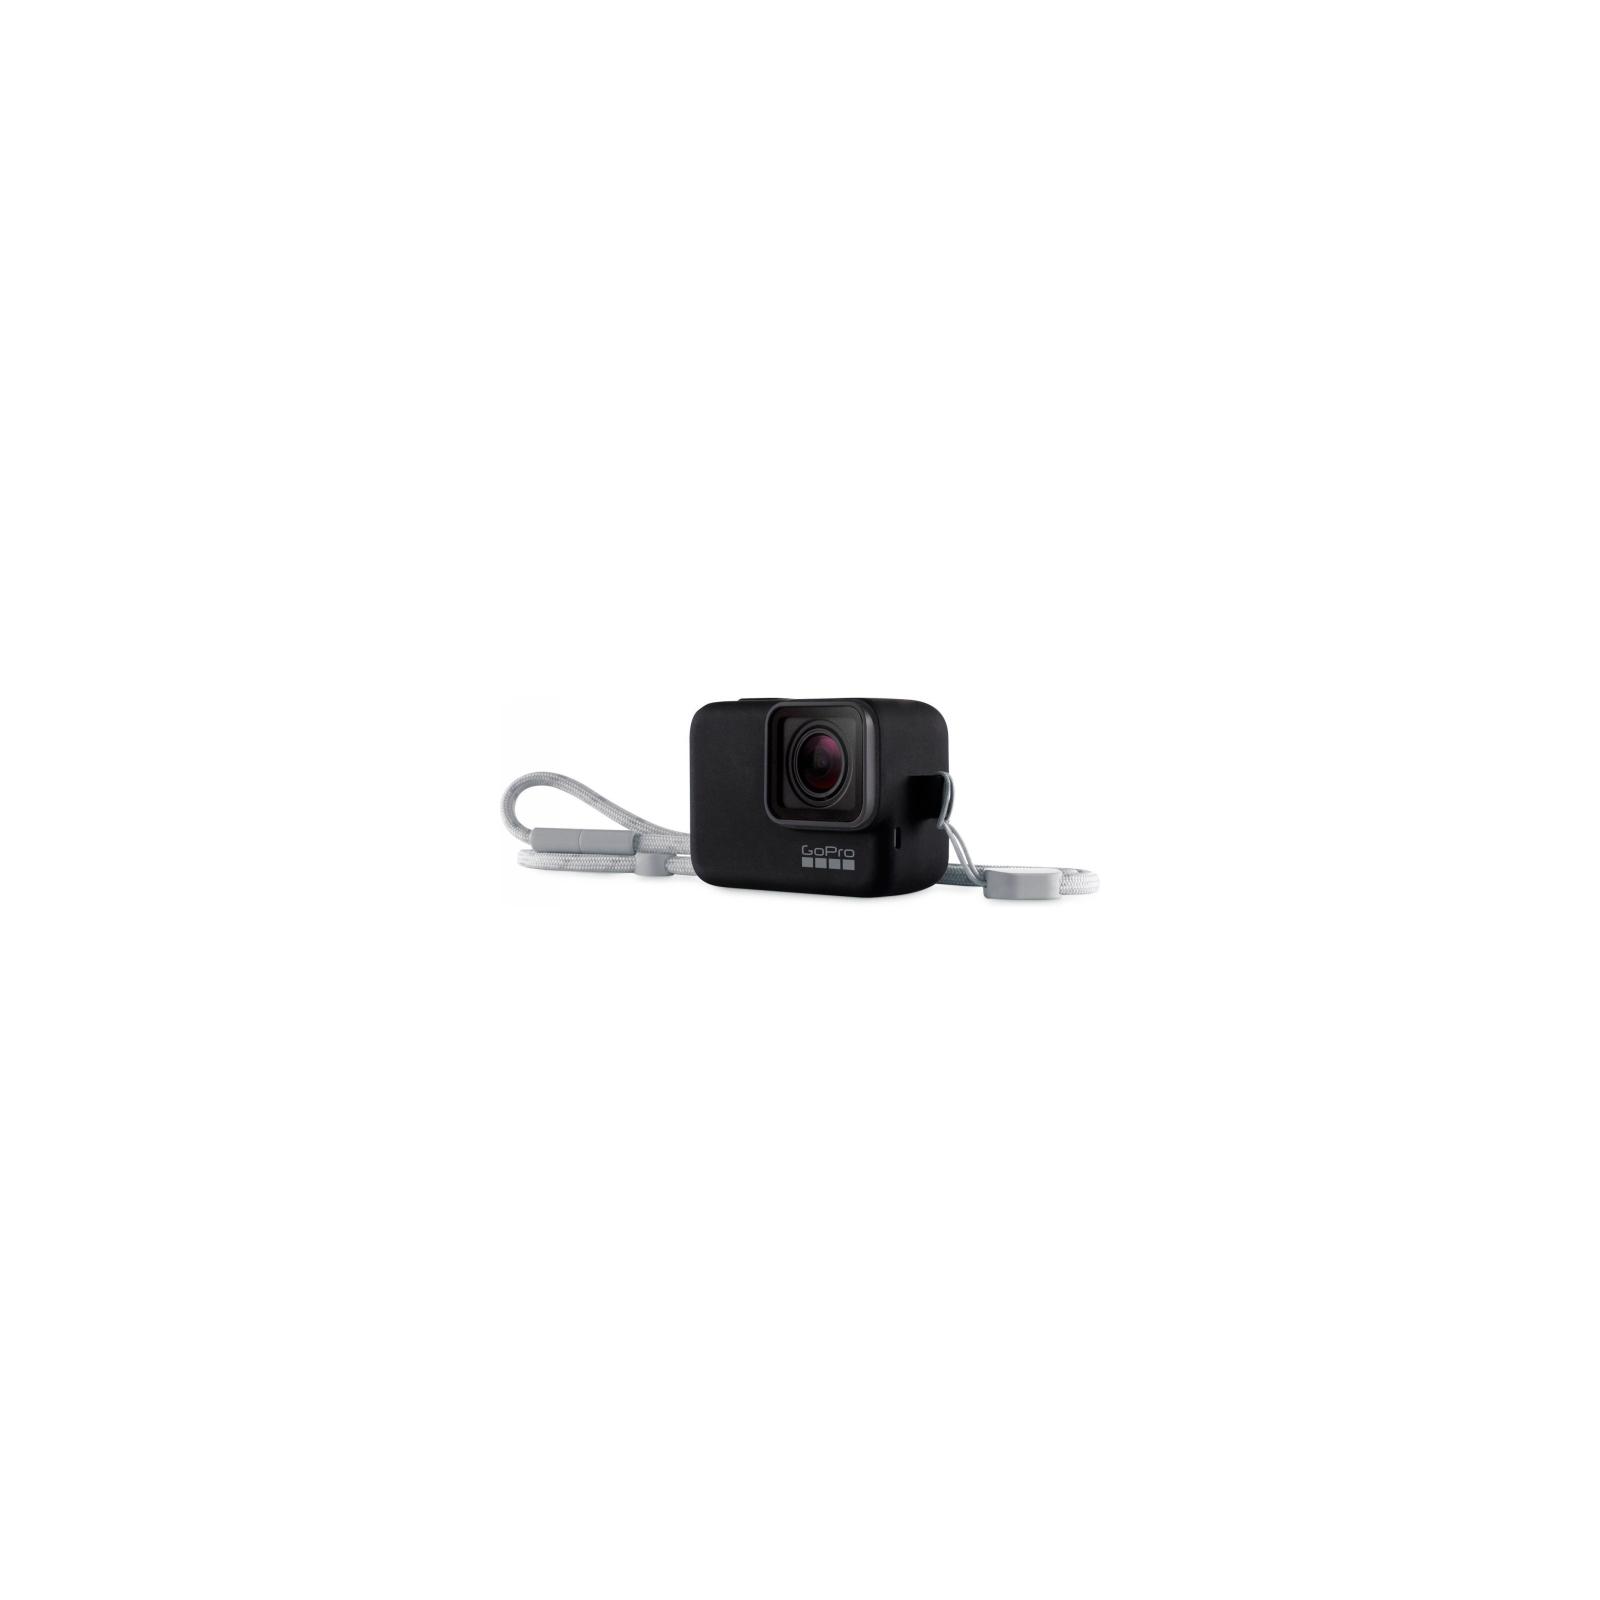 Аксессуар к экшн-камерам GoPro Sleeve & Lanyard (Black) (ACSST-001) изображение 3